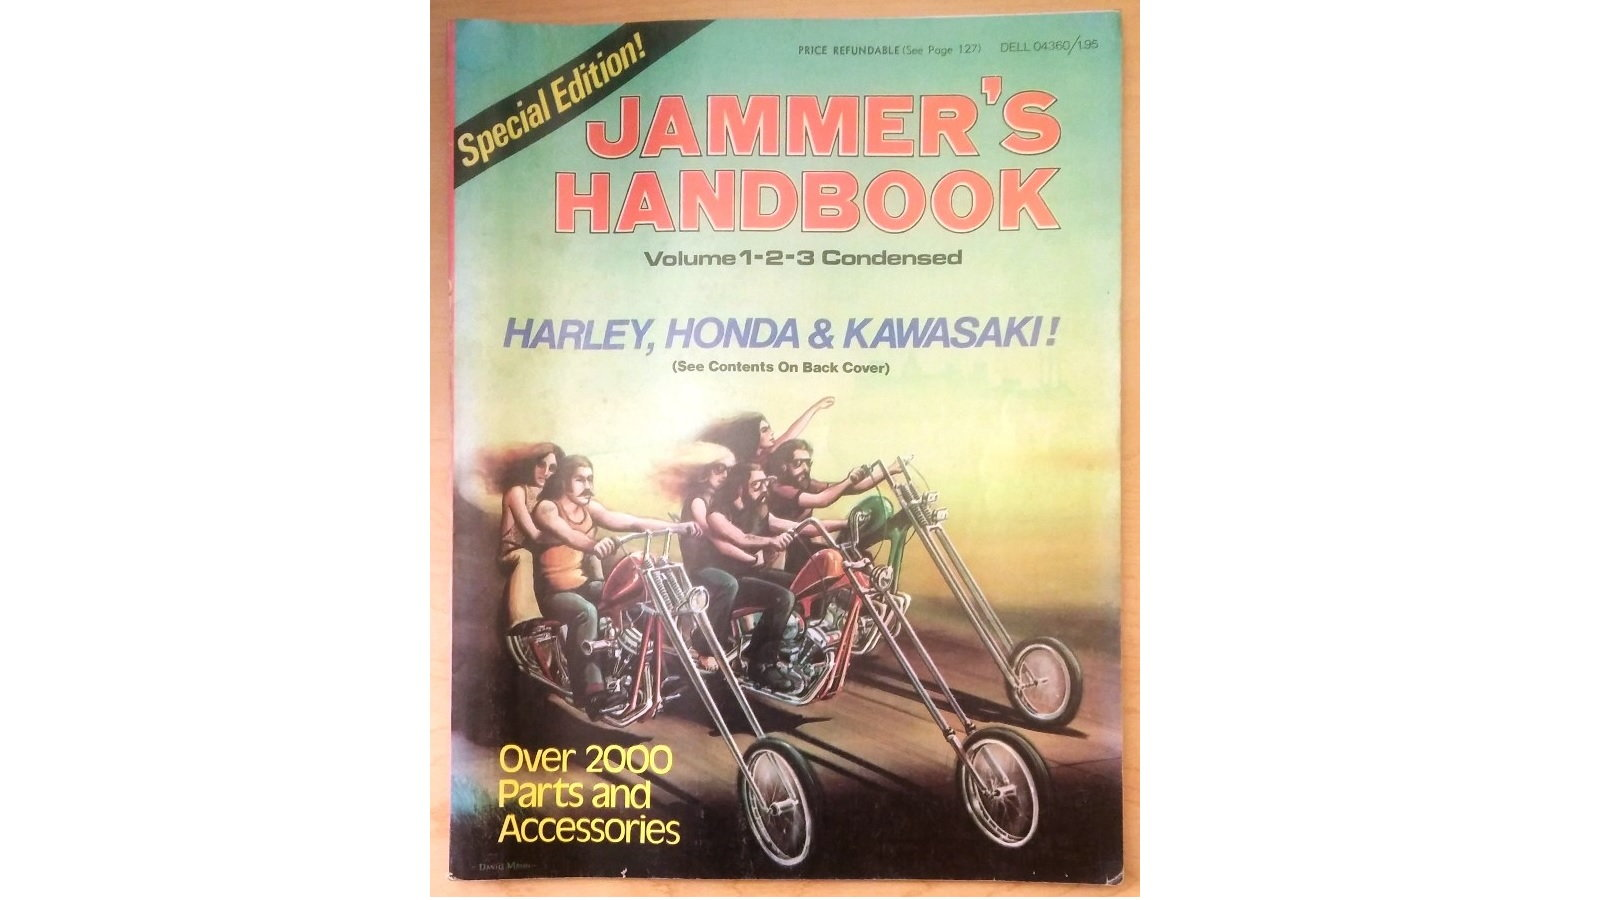 Jammers handbook motorcycles | China Wireless Pocket Phone Signal Jammer/Blocker for 2g+3G+WiFi+4G - China Wireless Jammer, Portable Jammer Blocker